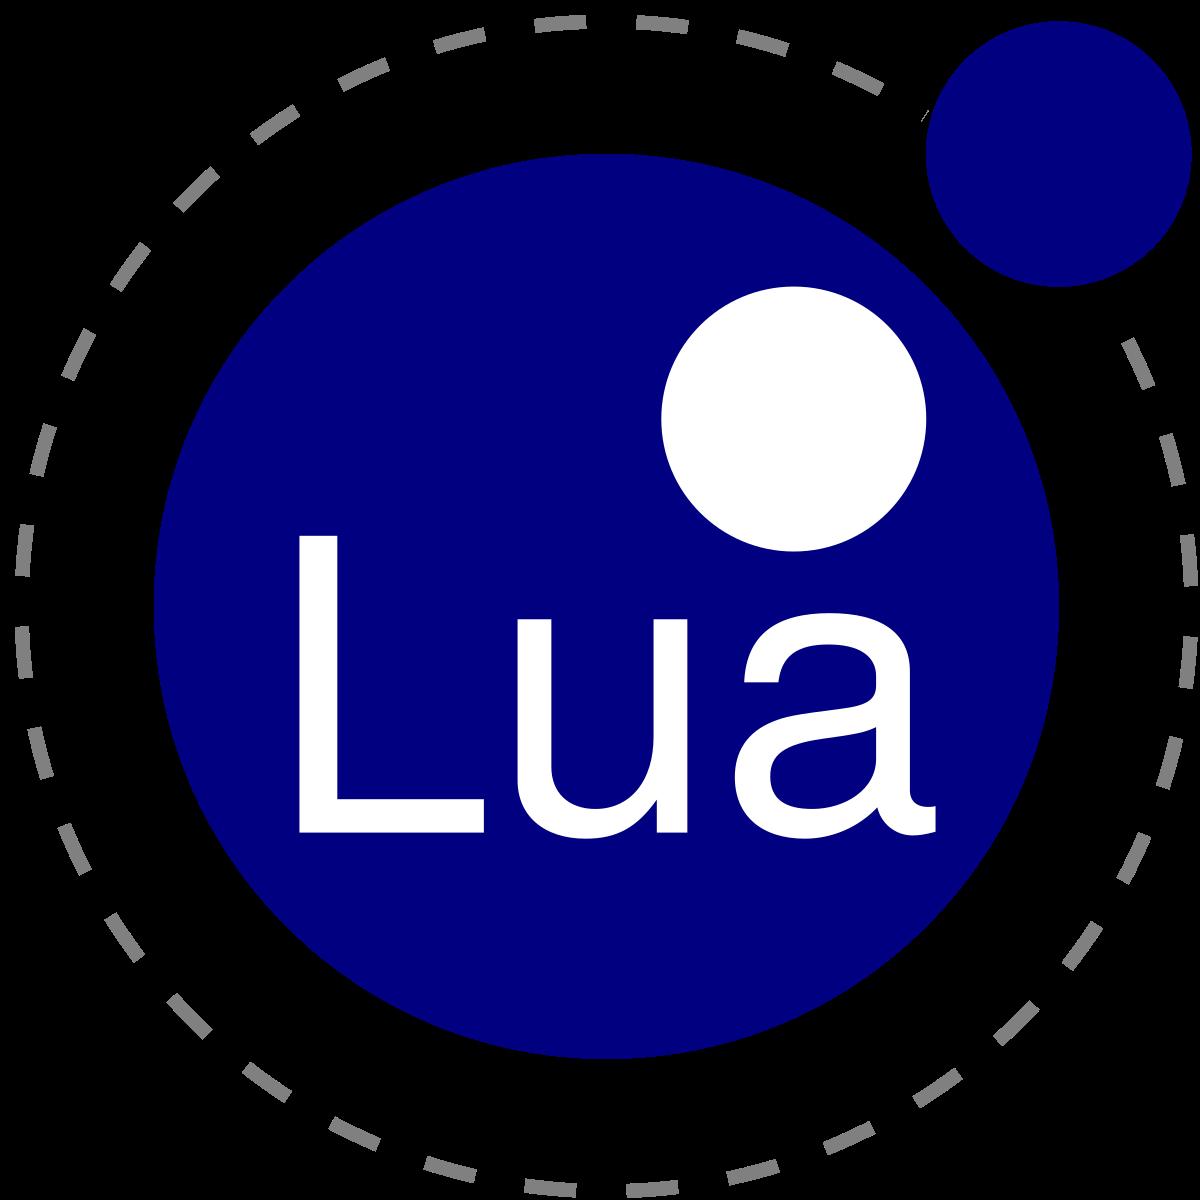 TOP 8 გამორჩეული Cleo/Lua სკრიპტი